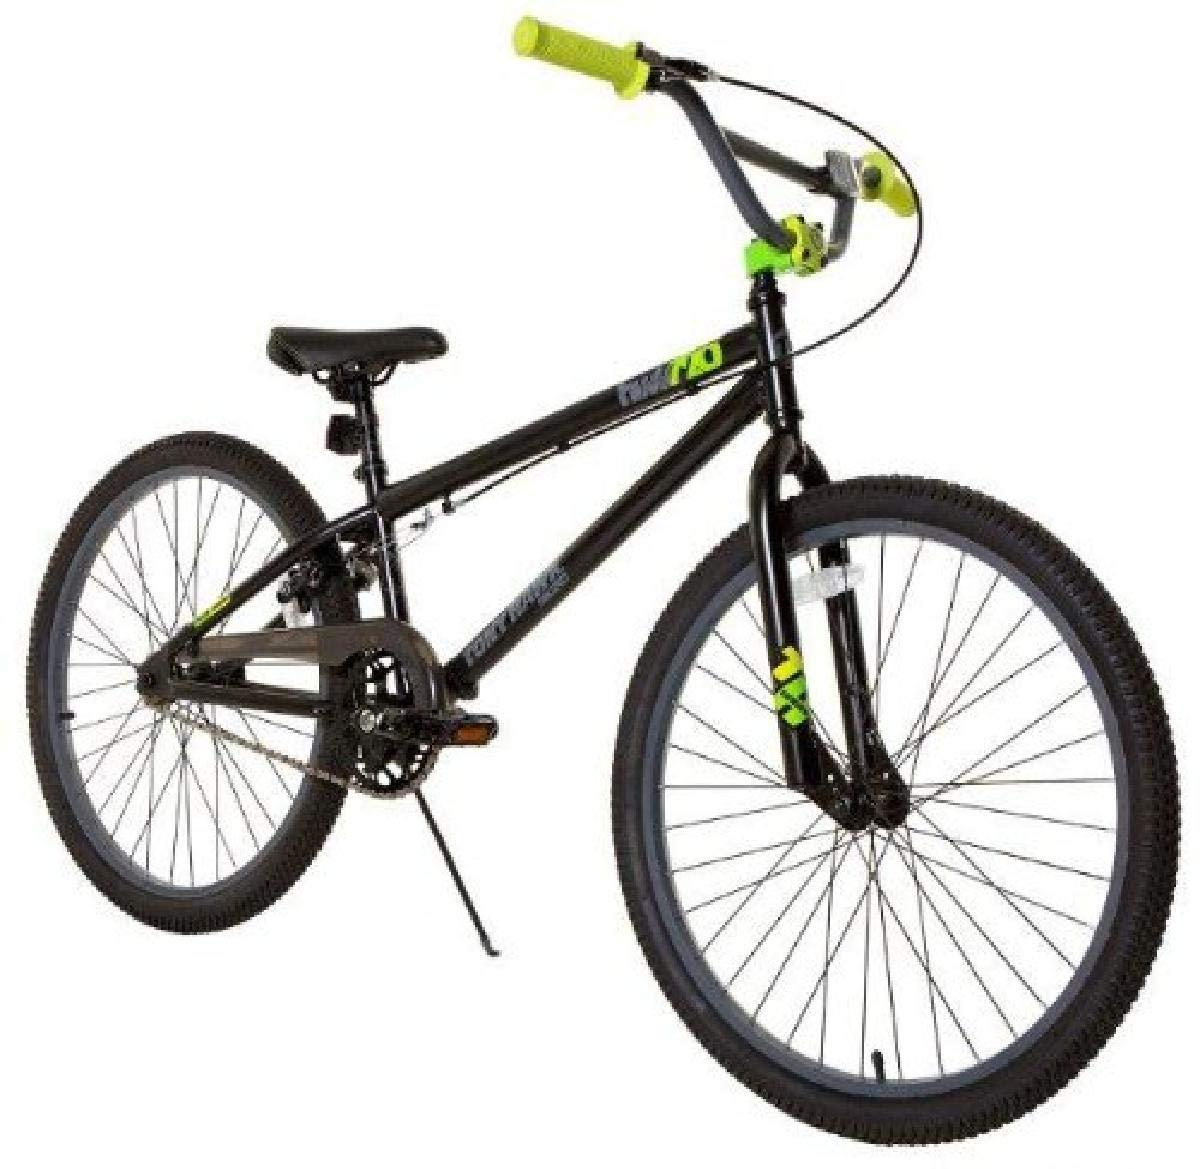 Dynacraft Tony Hawk Park系列BMX自由式自行车